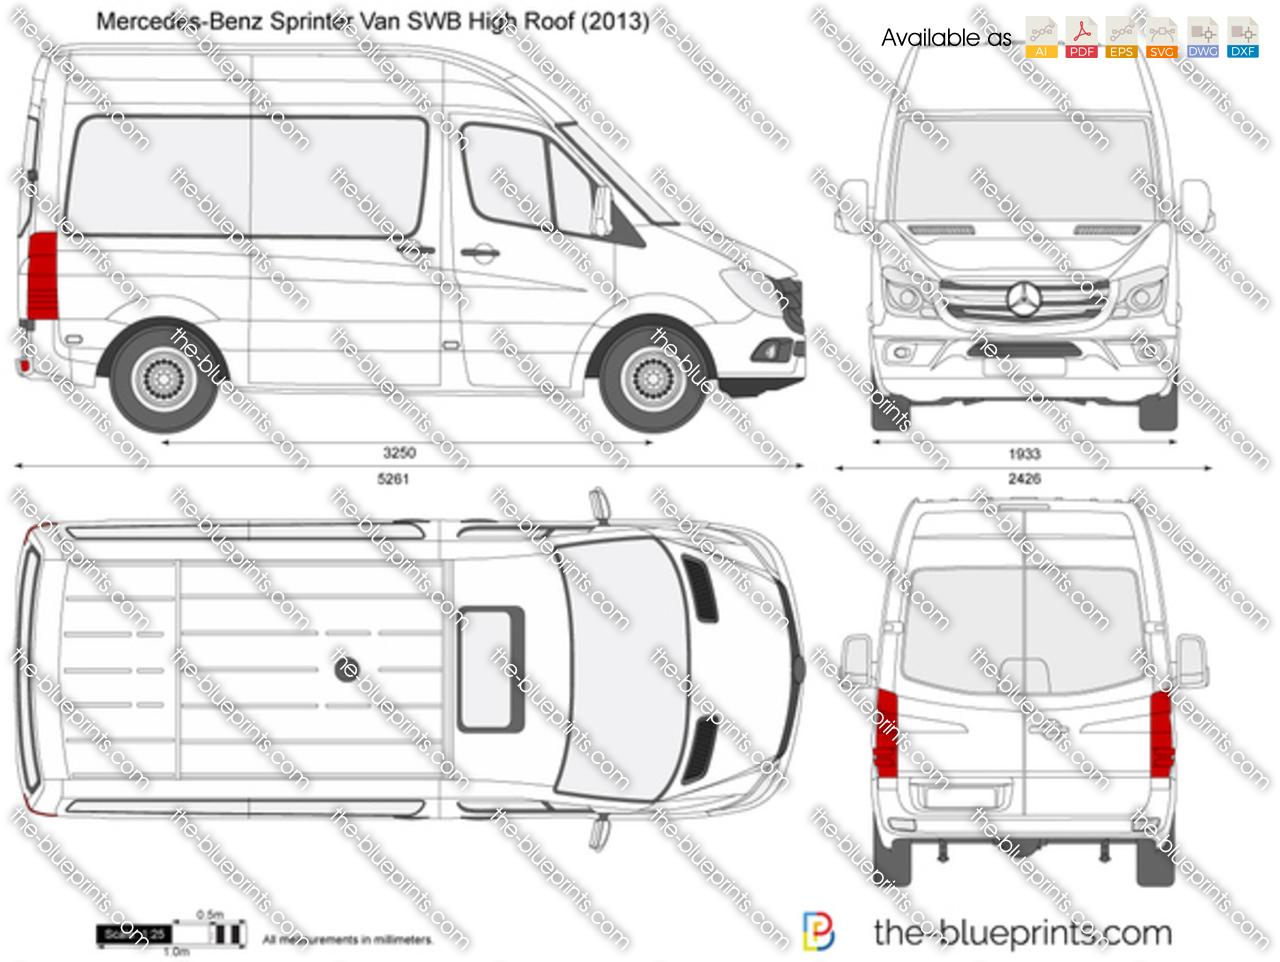 Mercedes Benz Sprinter Van Swb High Roof Vector Drawing